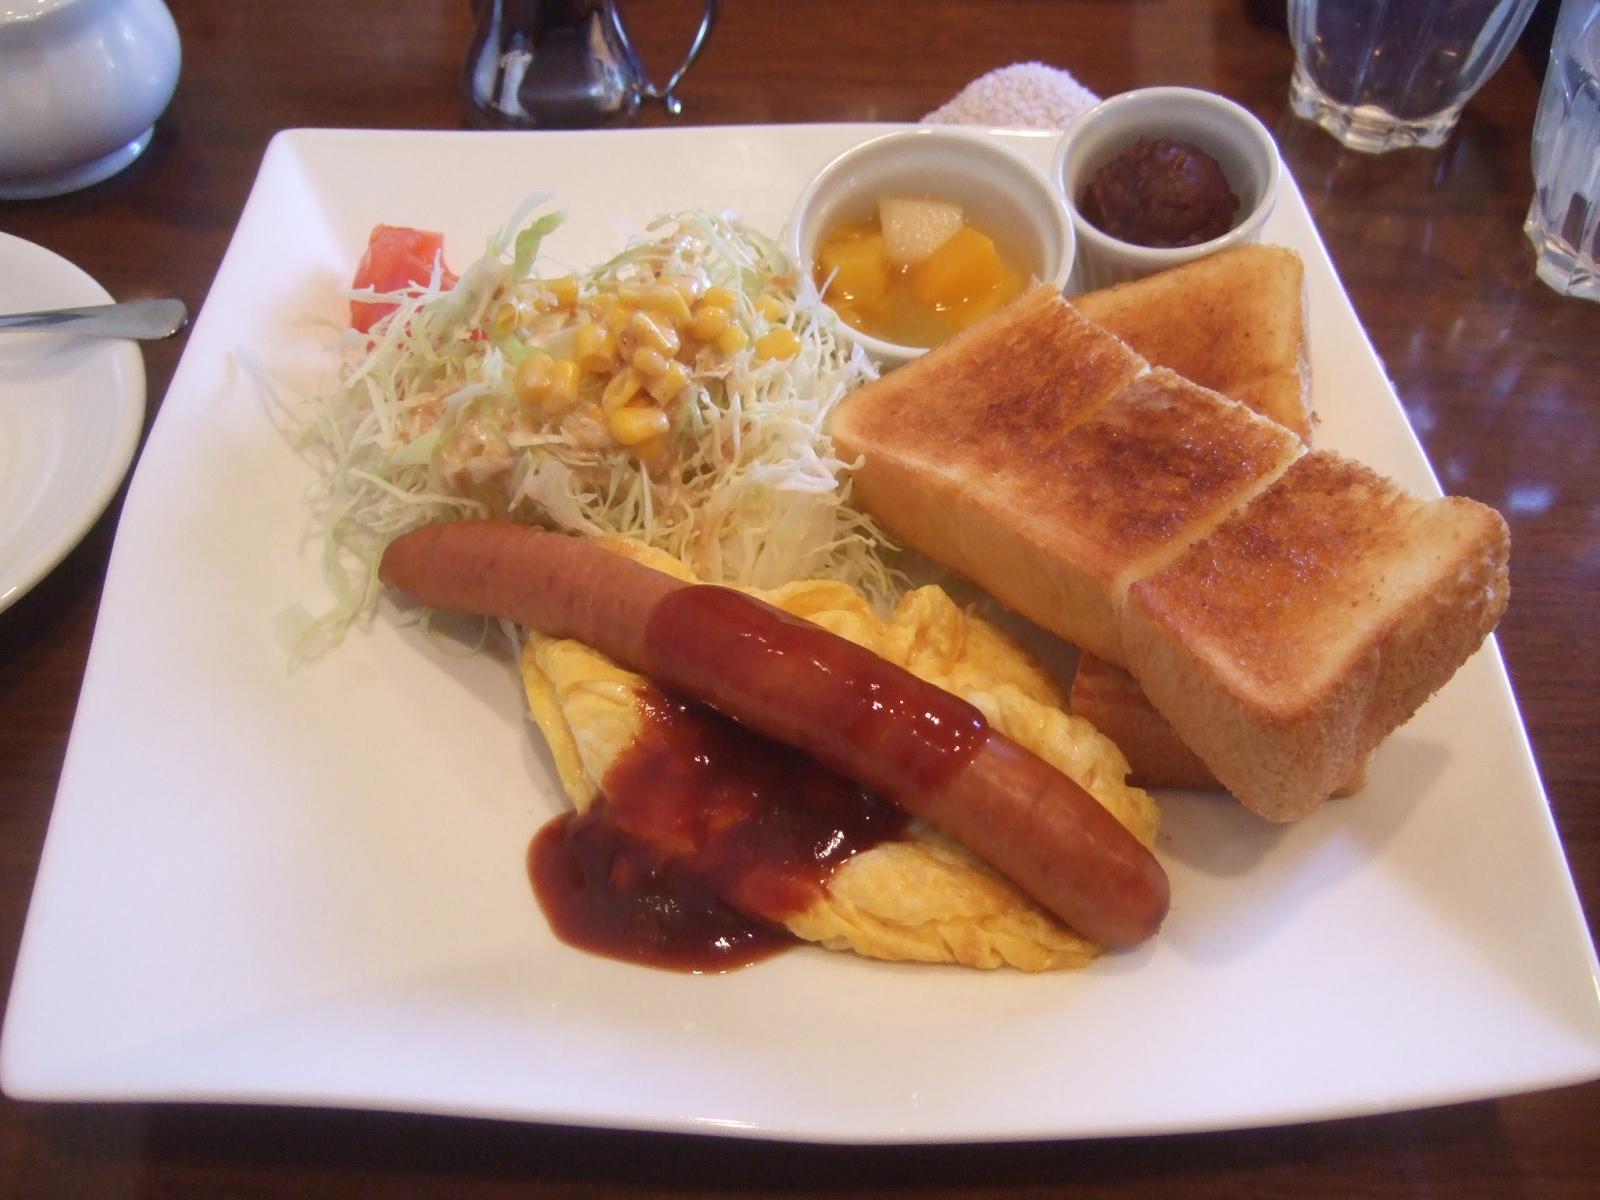 http://livedoor.blogimg.jp/iwasakiyasushi/imgs/b/f/bf6882f2ee16e6c2a23c.JPG